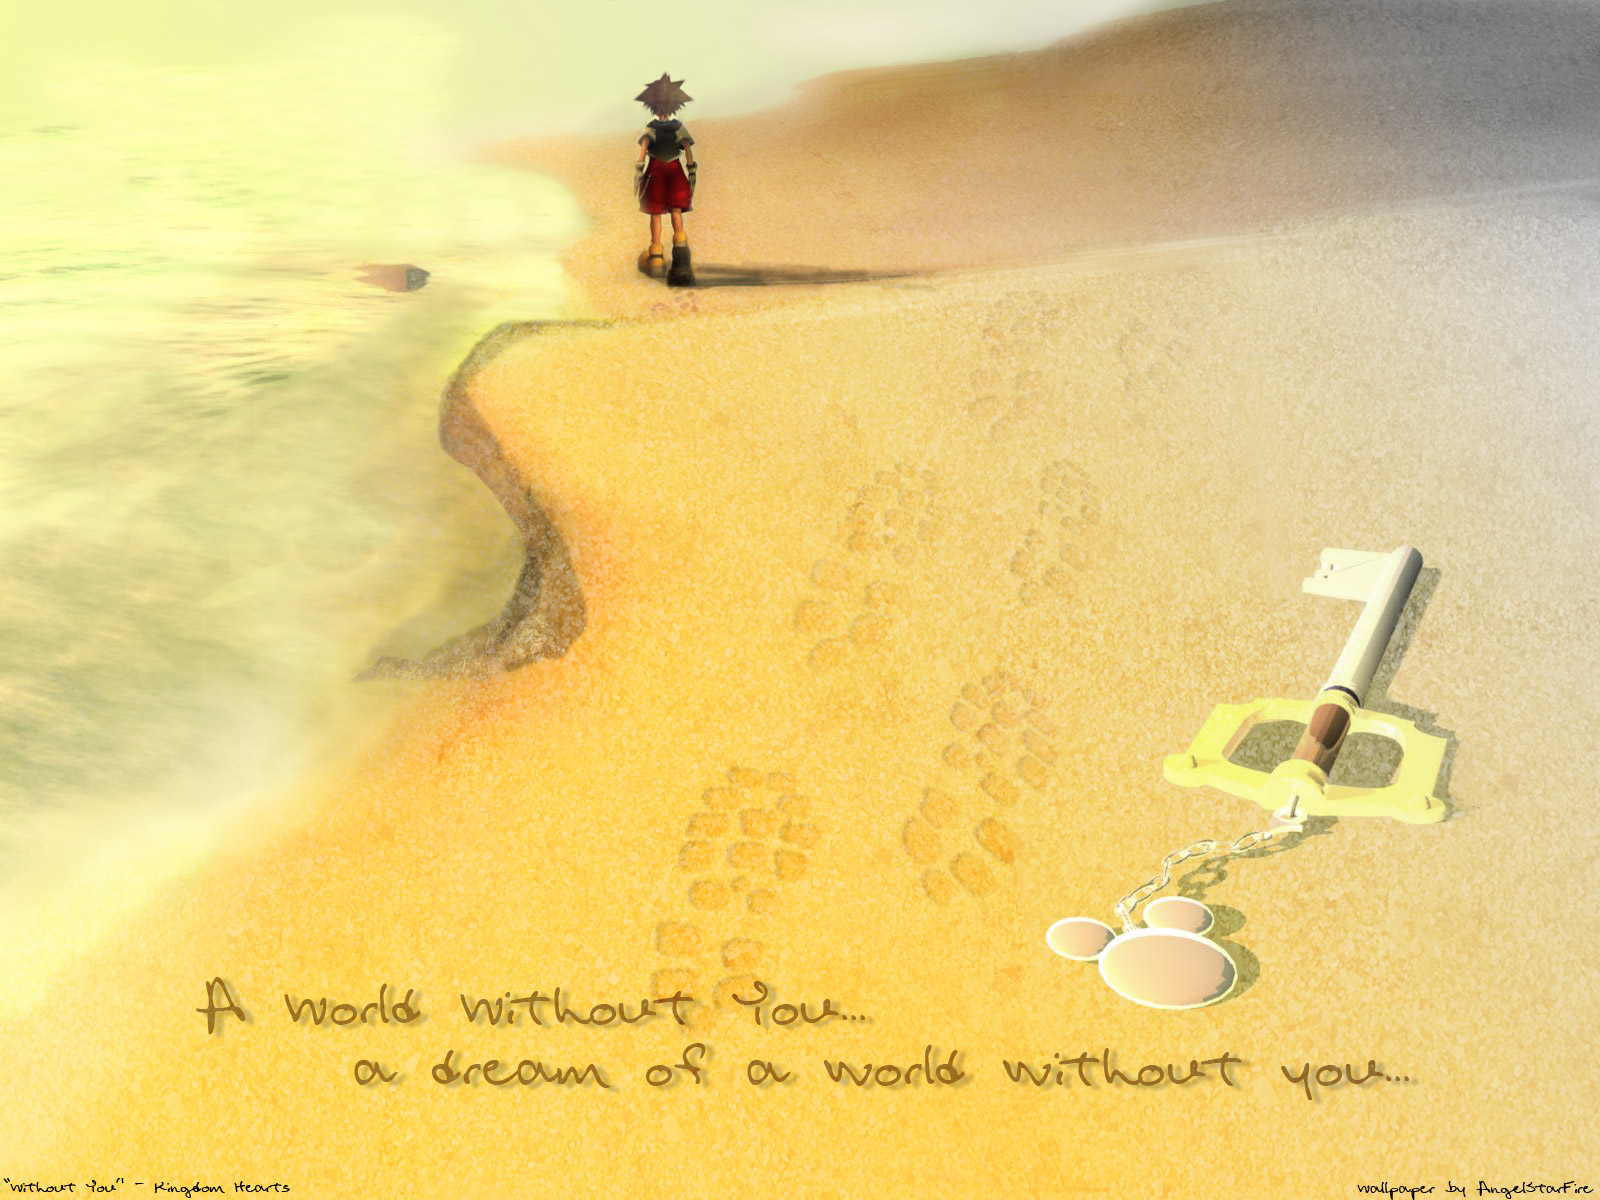 kingdom hearts anime image board